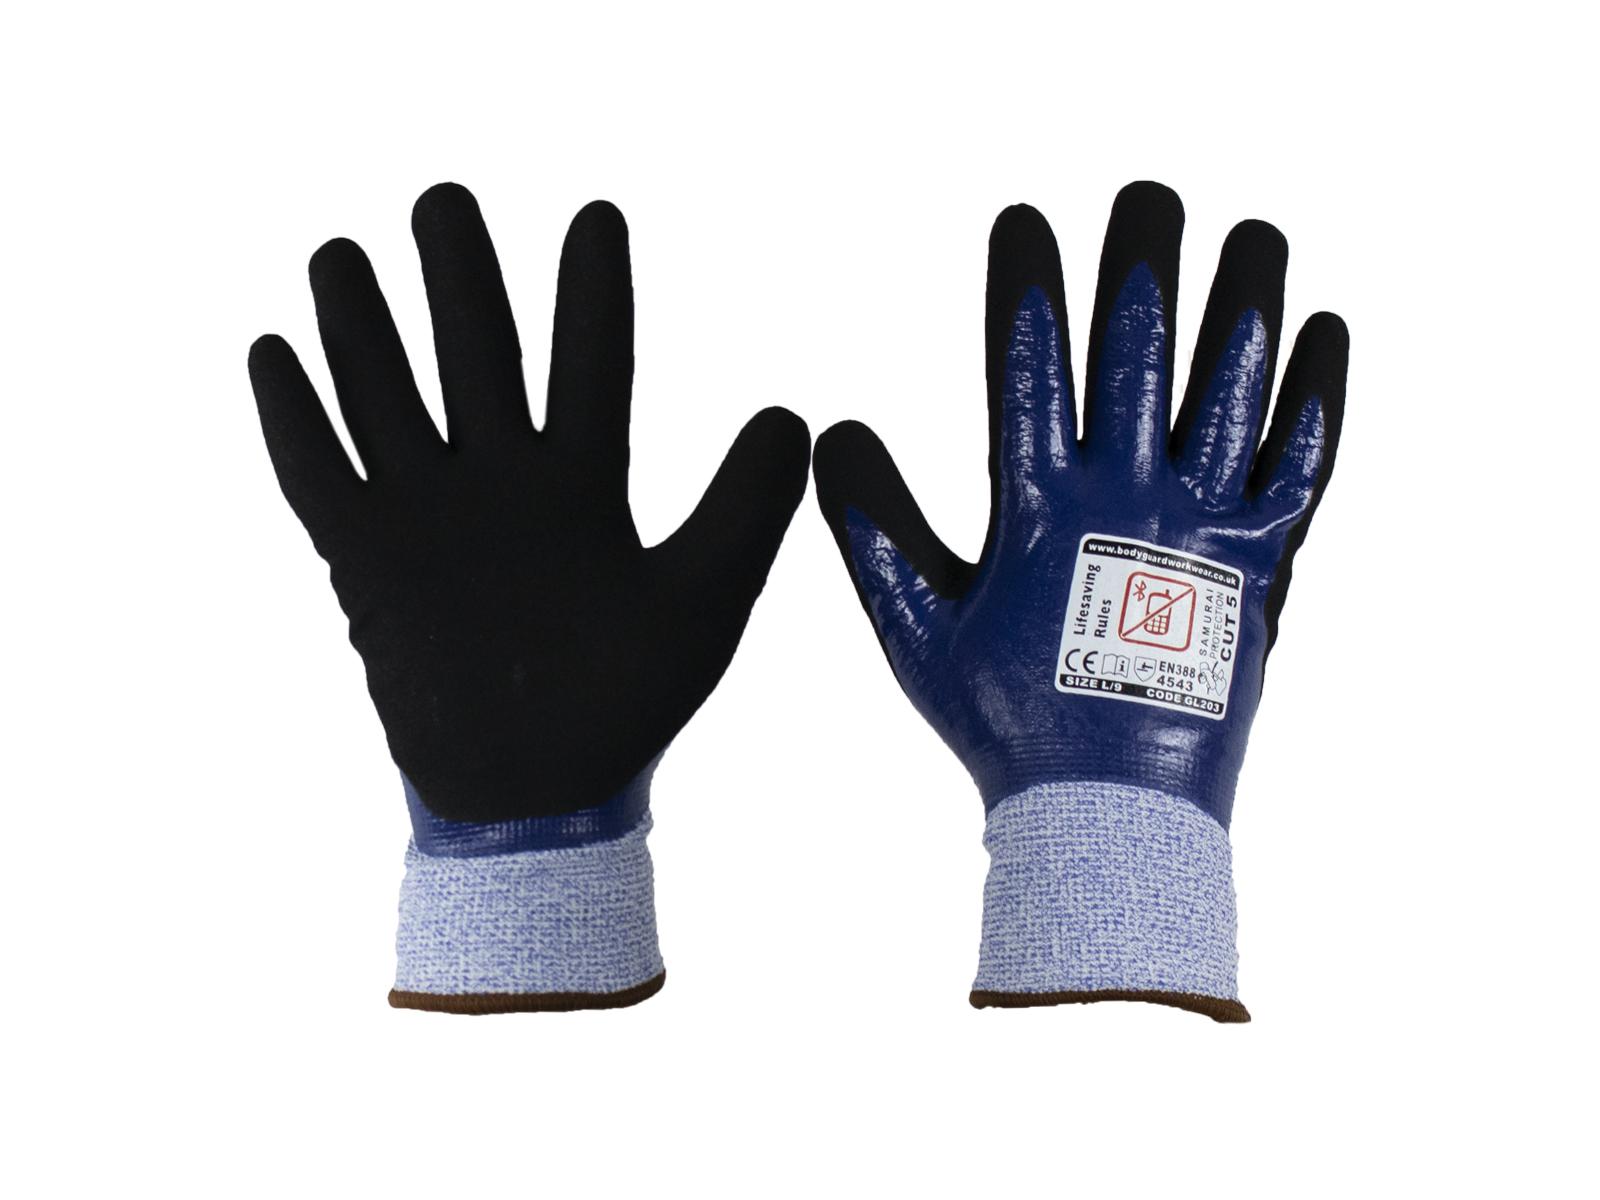 Samurai GL203 Thermo Wet Cut 5 Safety glove w/ Fleece Liner